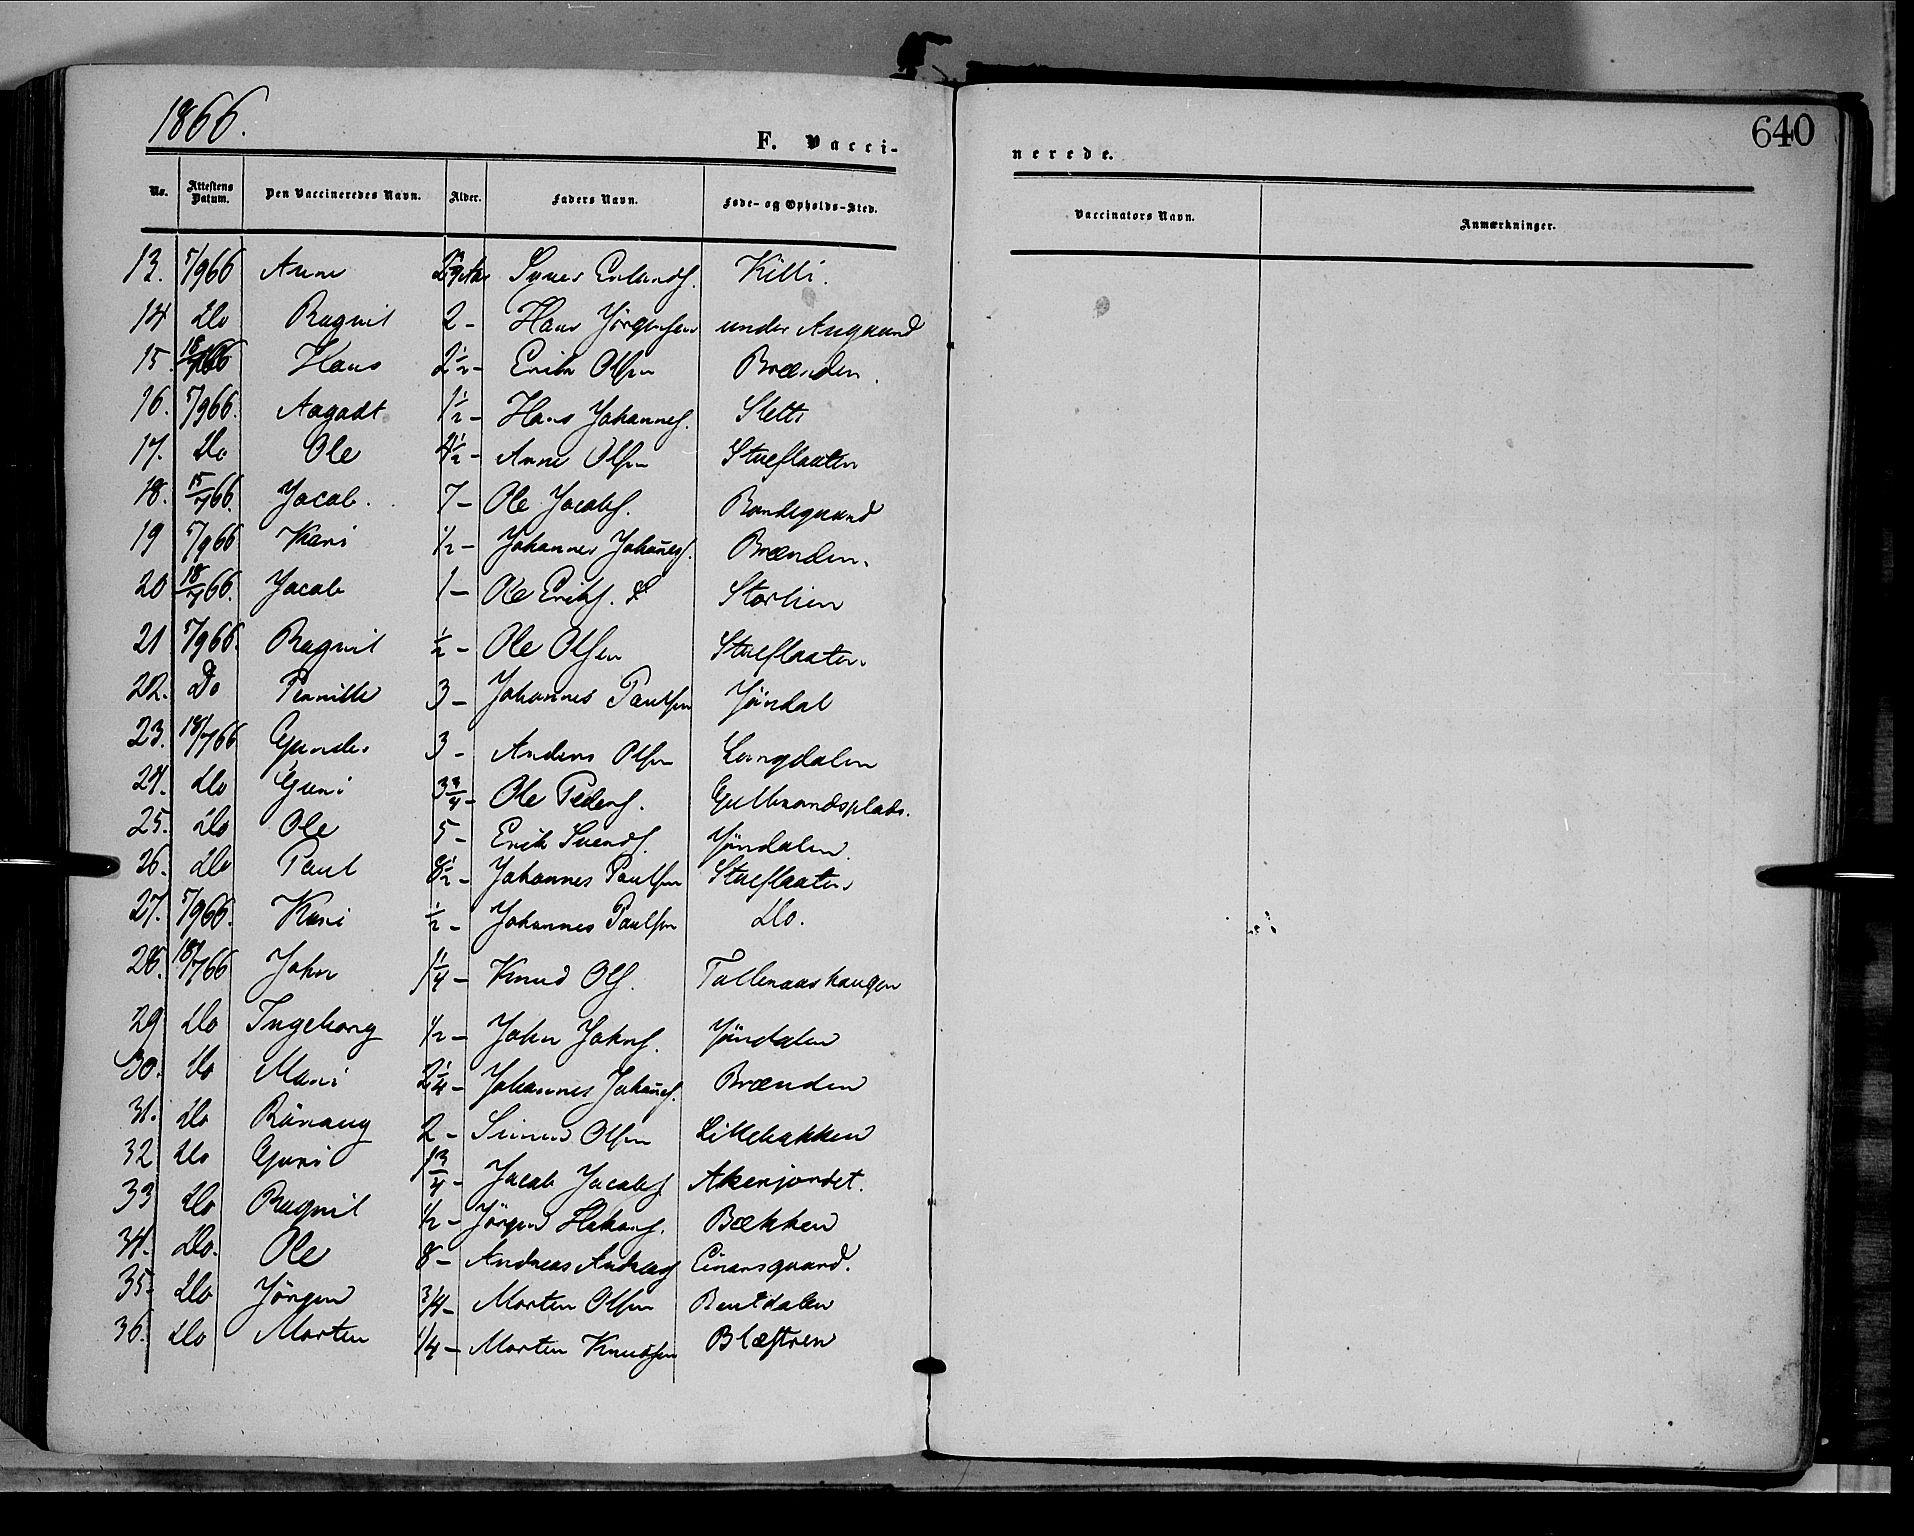 SAH, Dovre prestekontor, Ministerialbok nr. 1, 1854-1878, s. 640